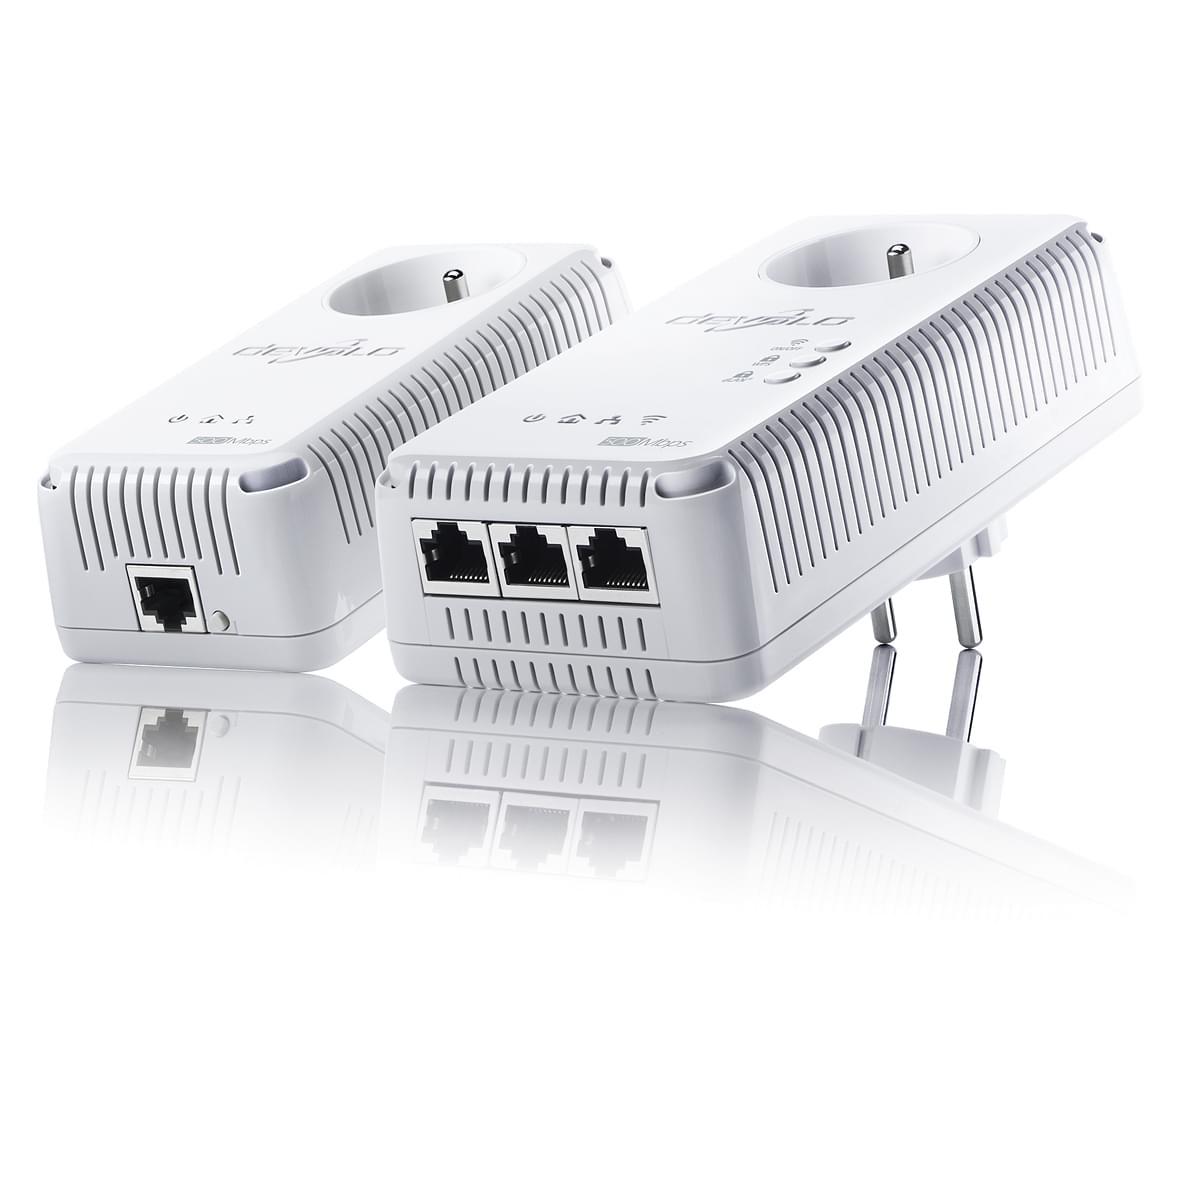 Devolo dLAN 500 AV Wireless+ Starter Kit (1829) - Achat / Vente Adaptateur CPL sur Cybertek.fr - 0